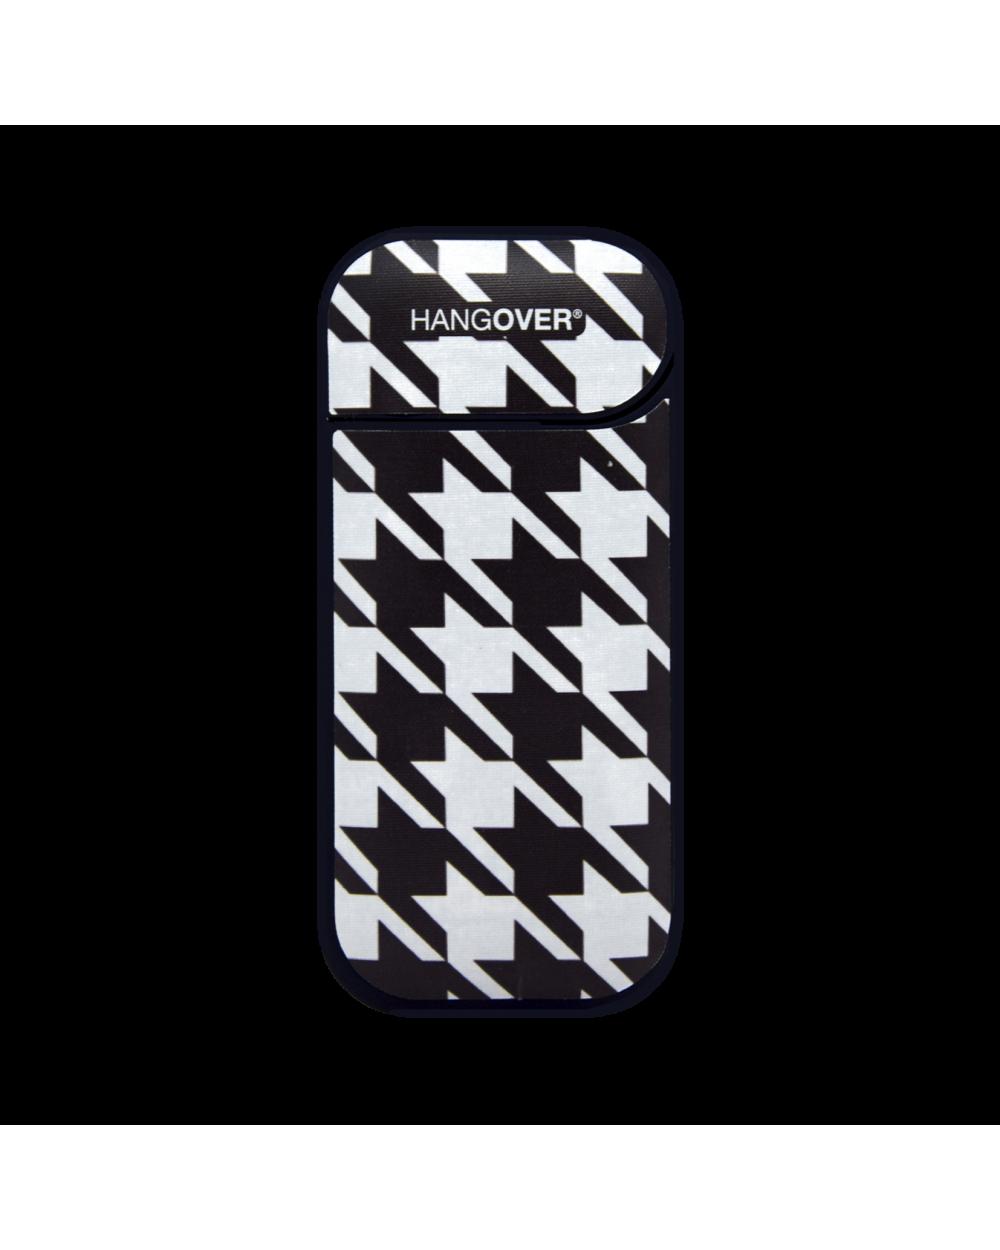 Pieddepoule - Cover SmartSkin in Tessuto Speciale per Iqos 2.4 e 2.4 plus by Hangover